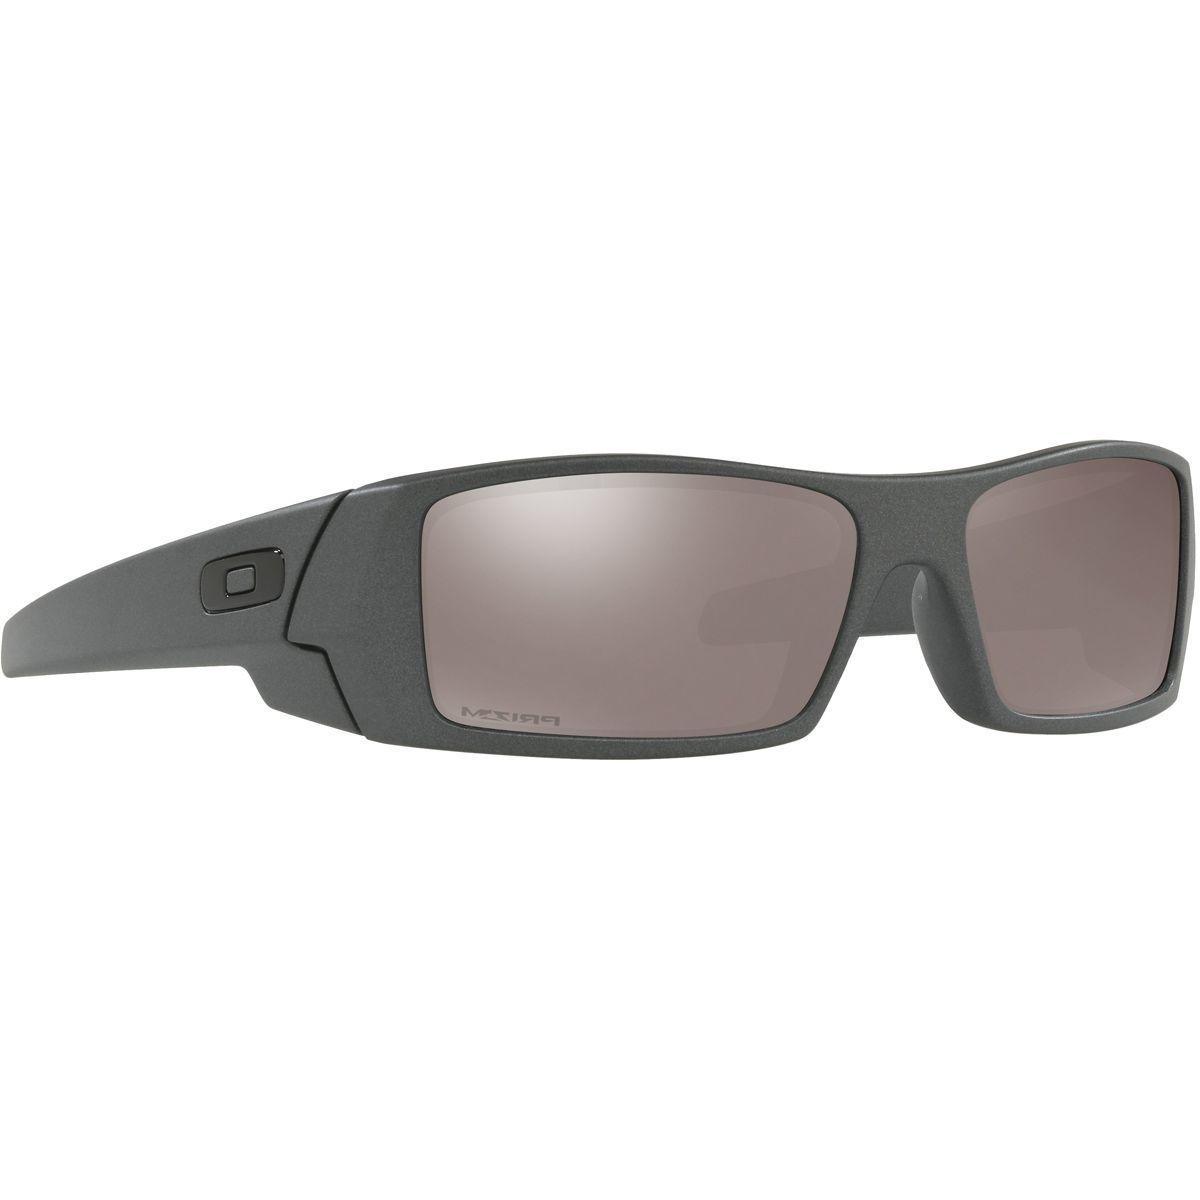 Oakley Gascan Prizm Polarized Sunglasses - Men's